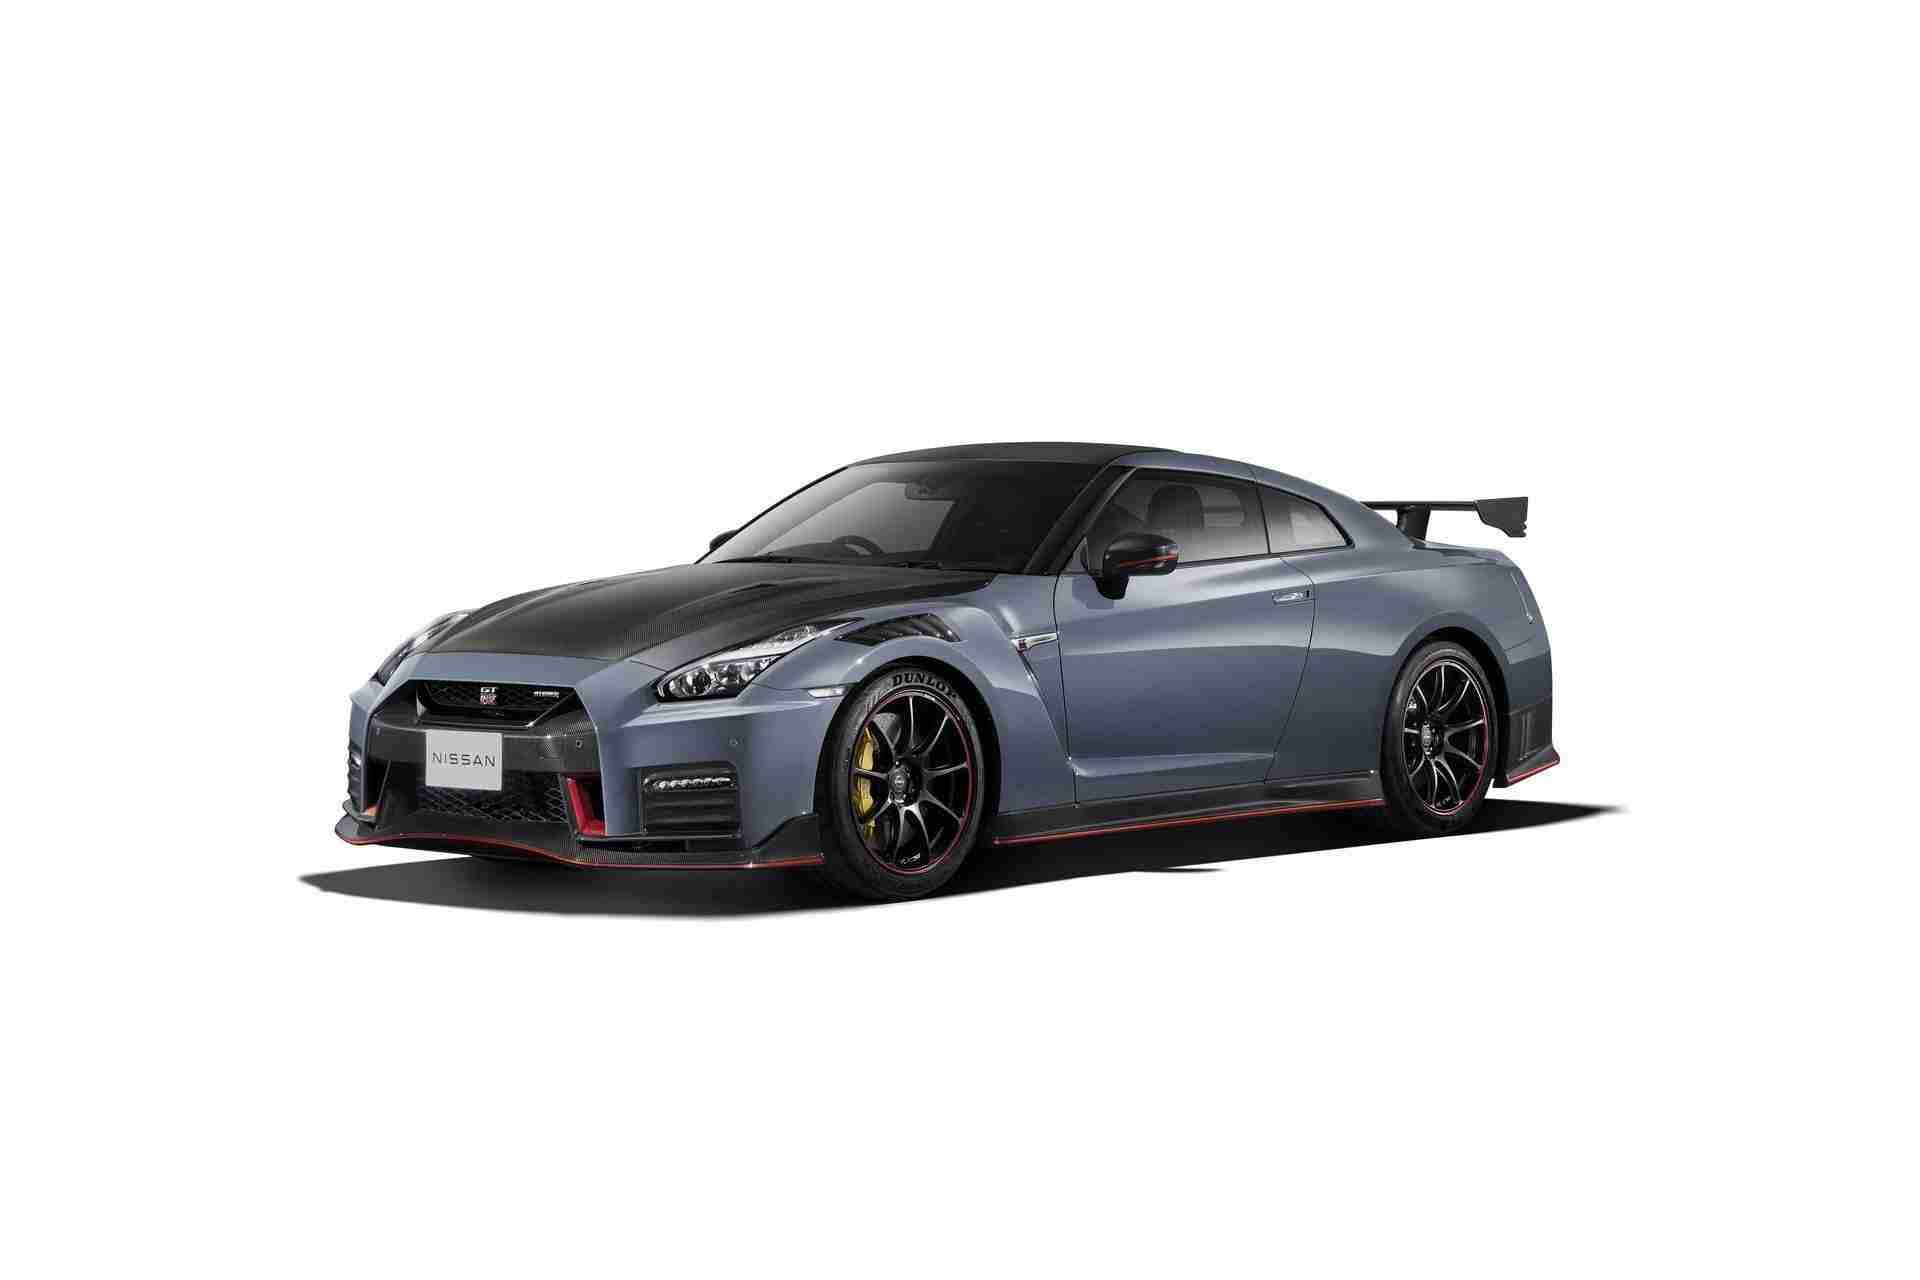 2021_Nissan_GT-R_Nismo-Special_Edition-0034